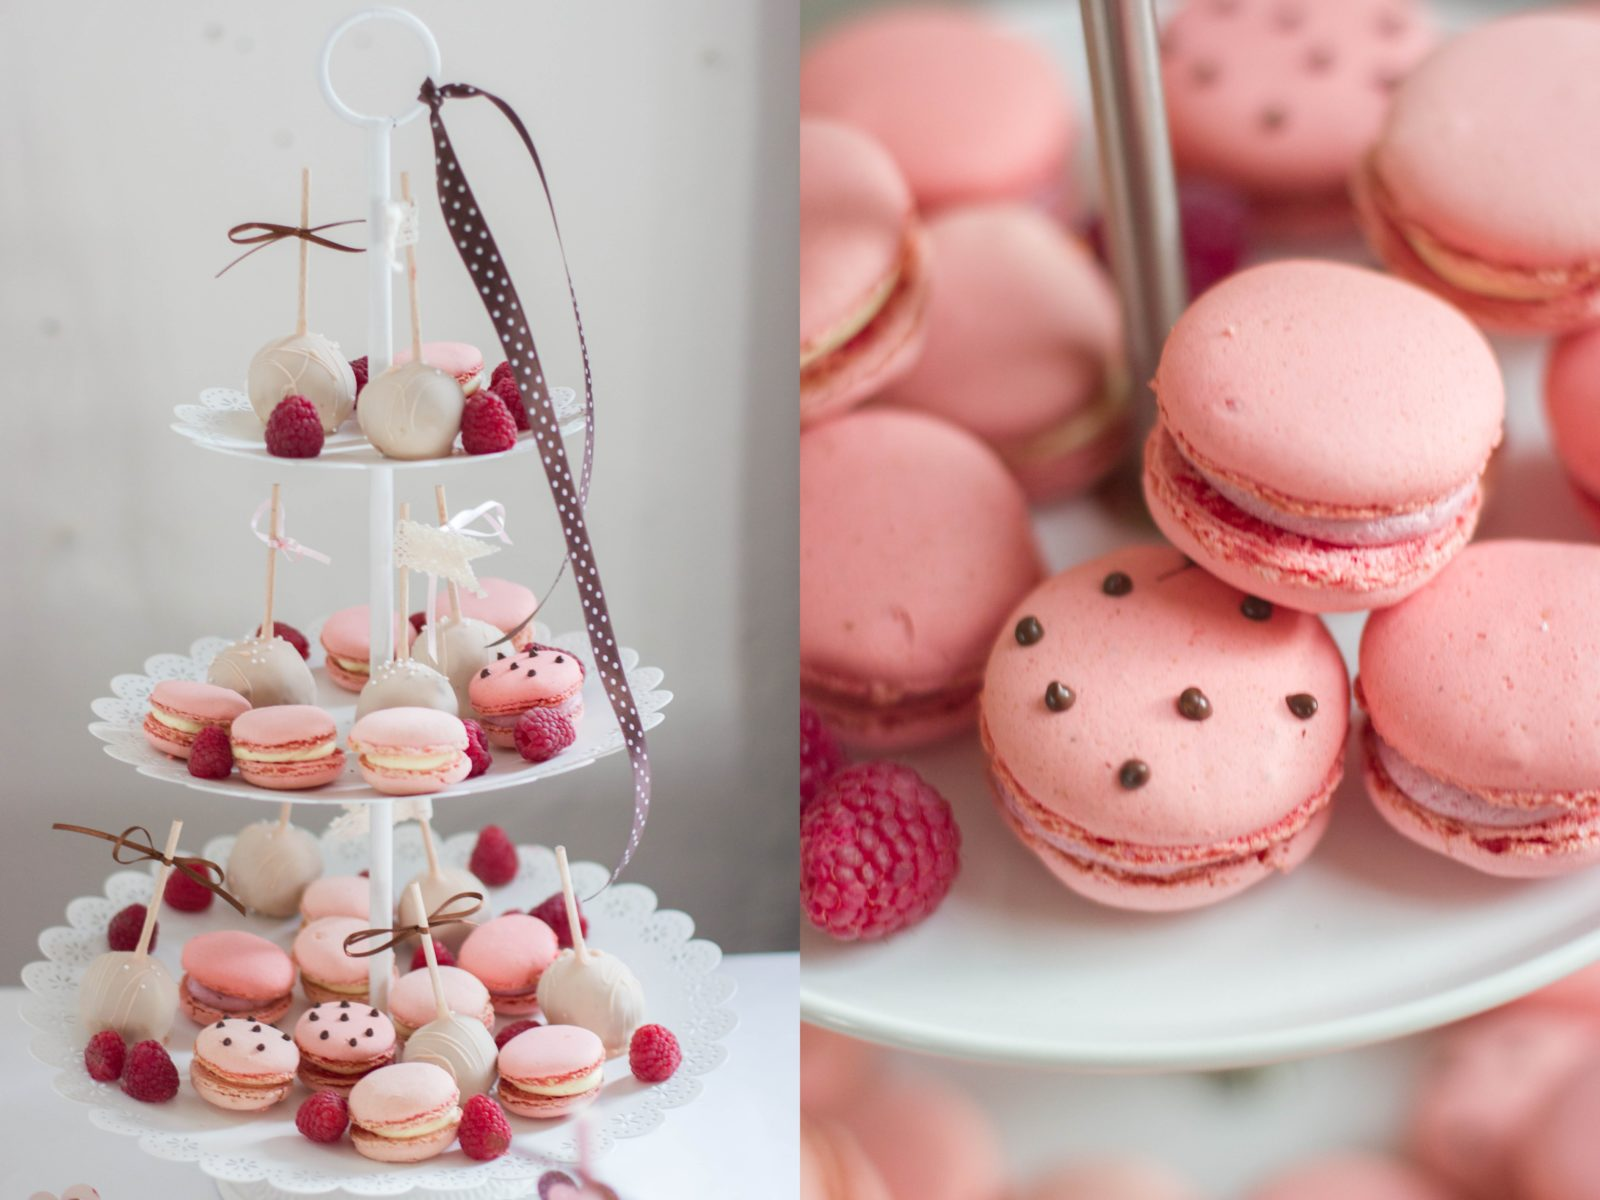 maccaron cake-pop